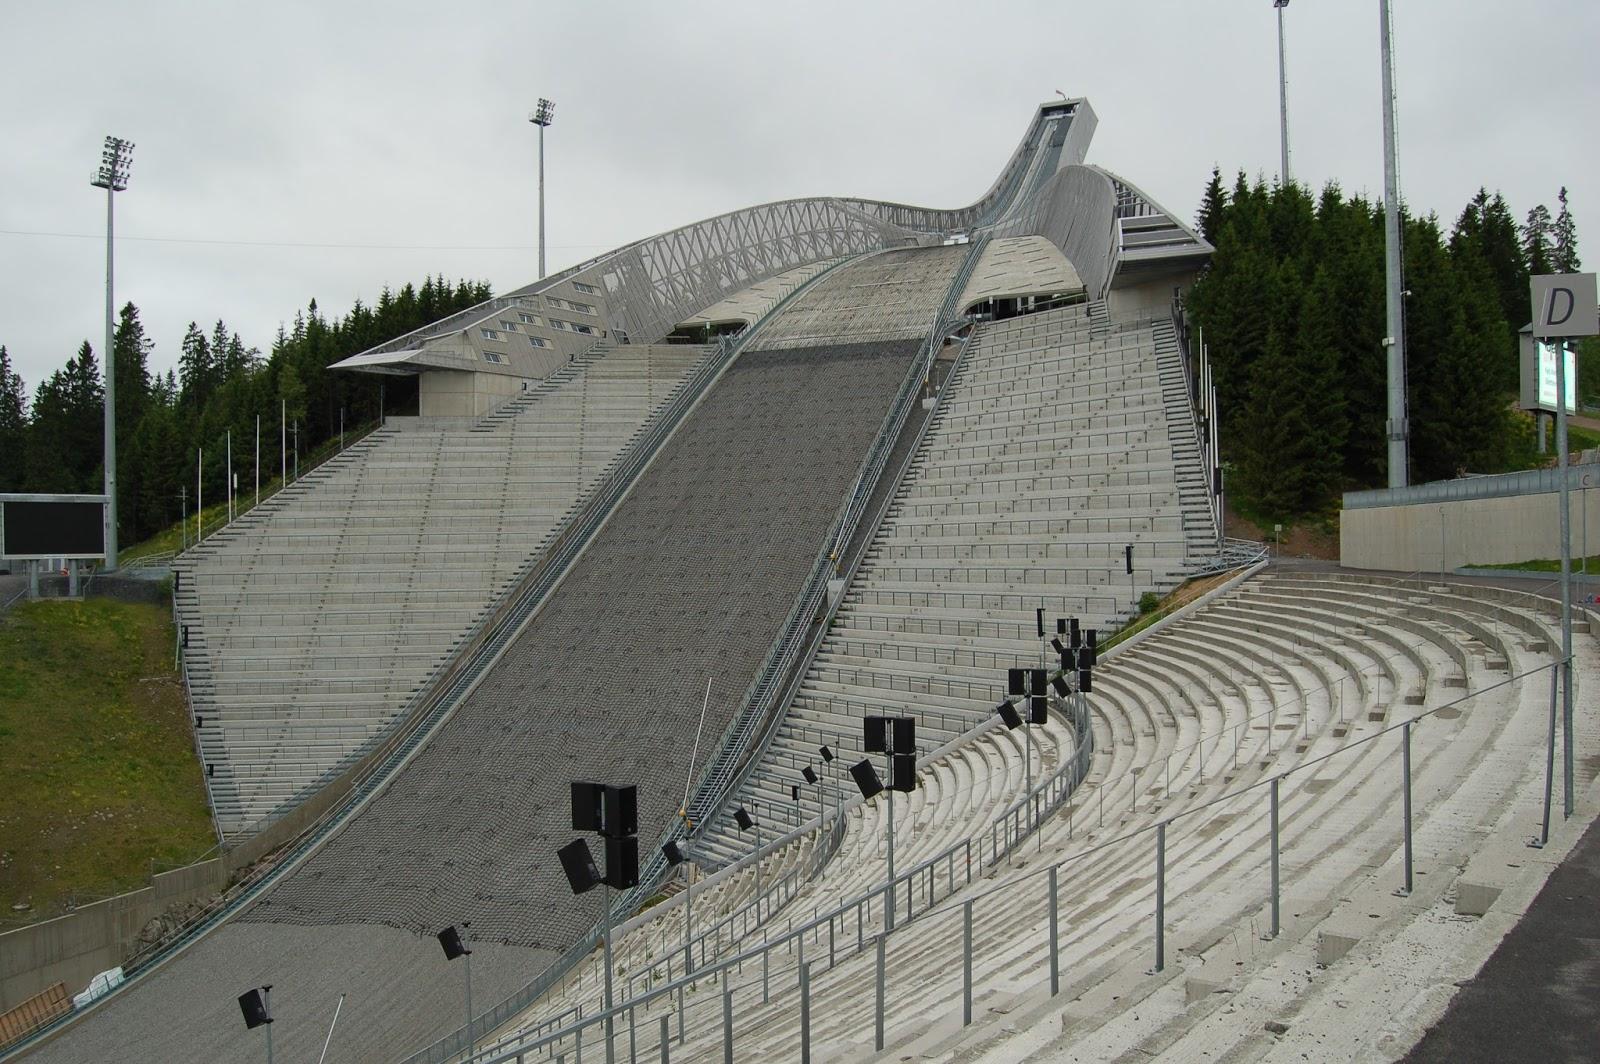 skoki narciarskie, Holmenkollen Oslo Norwegia